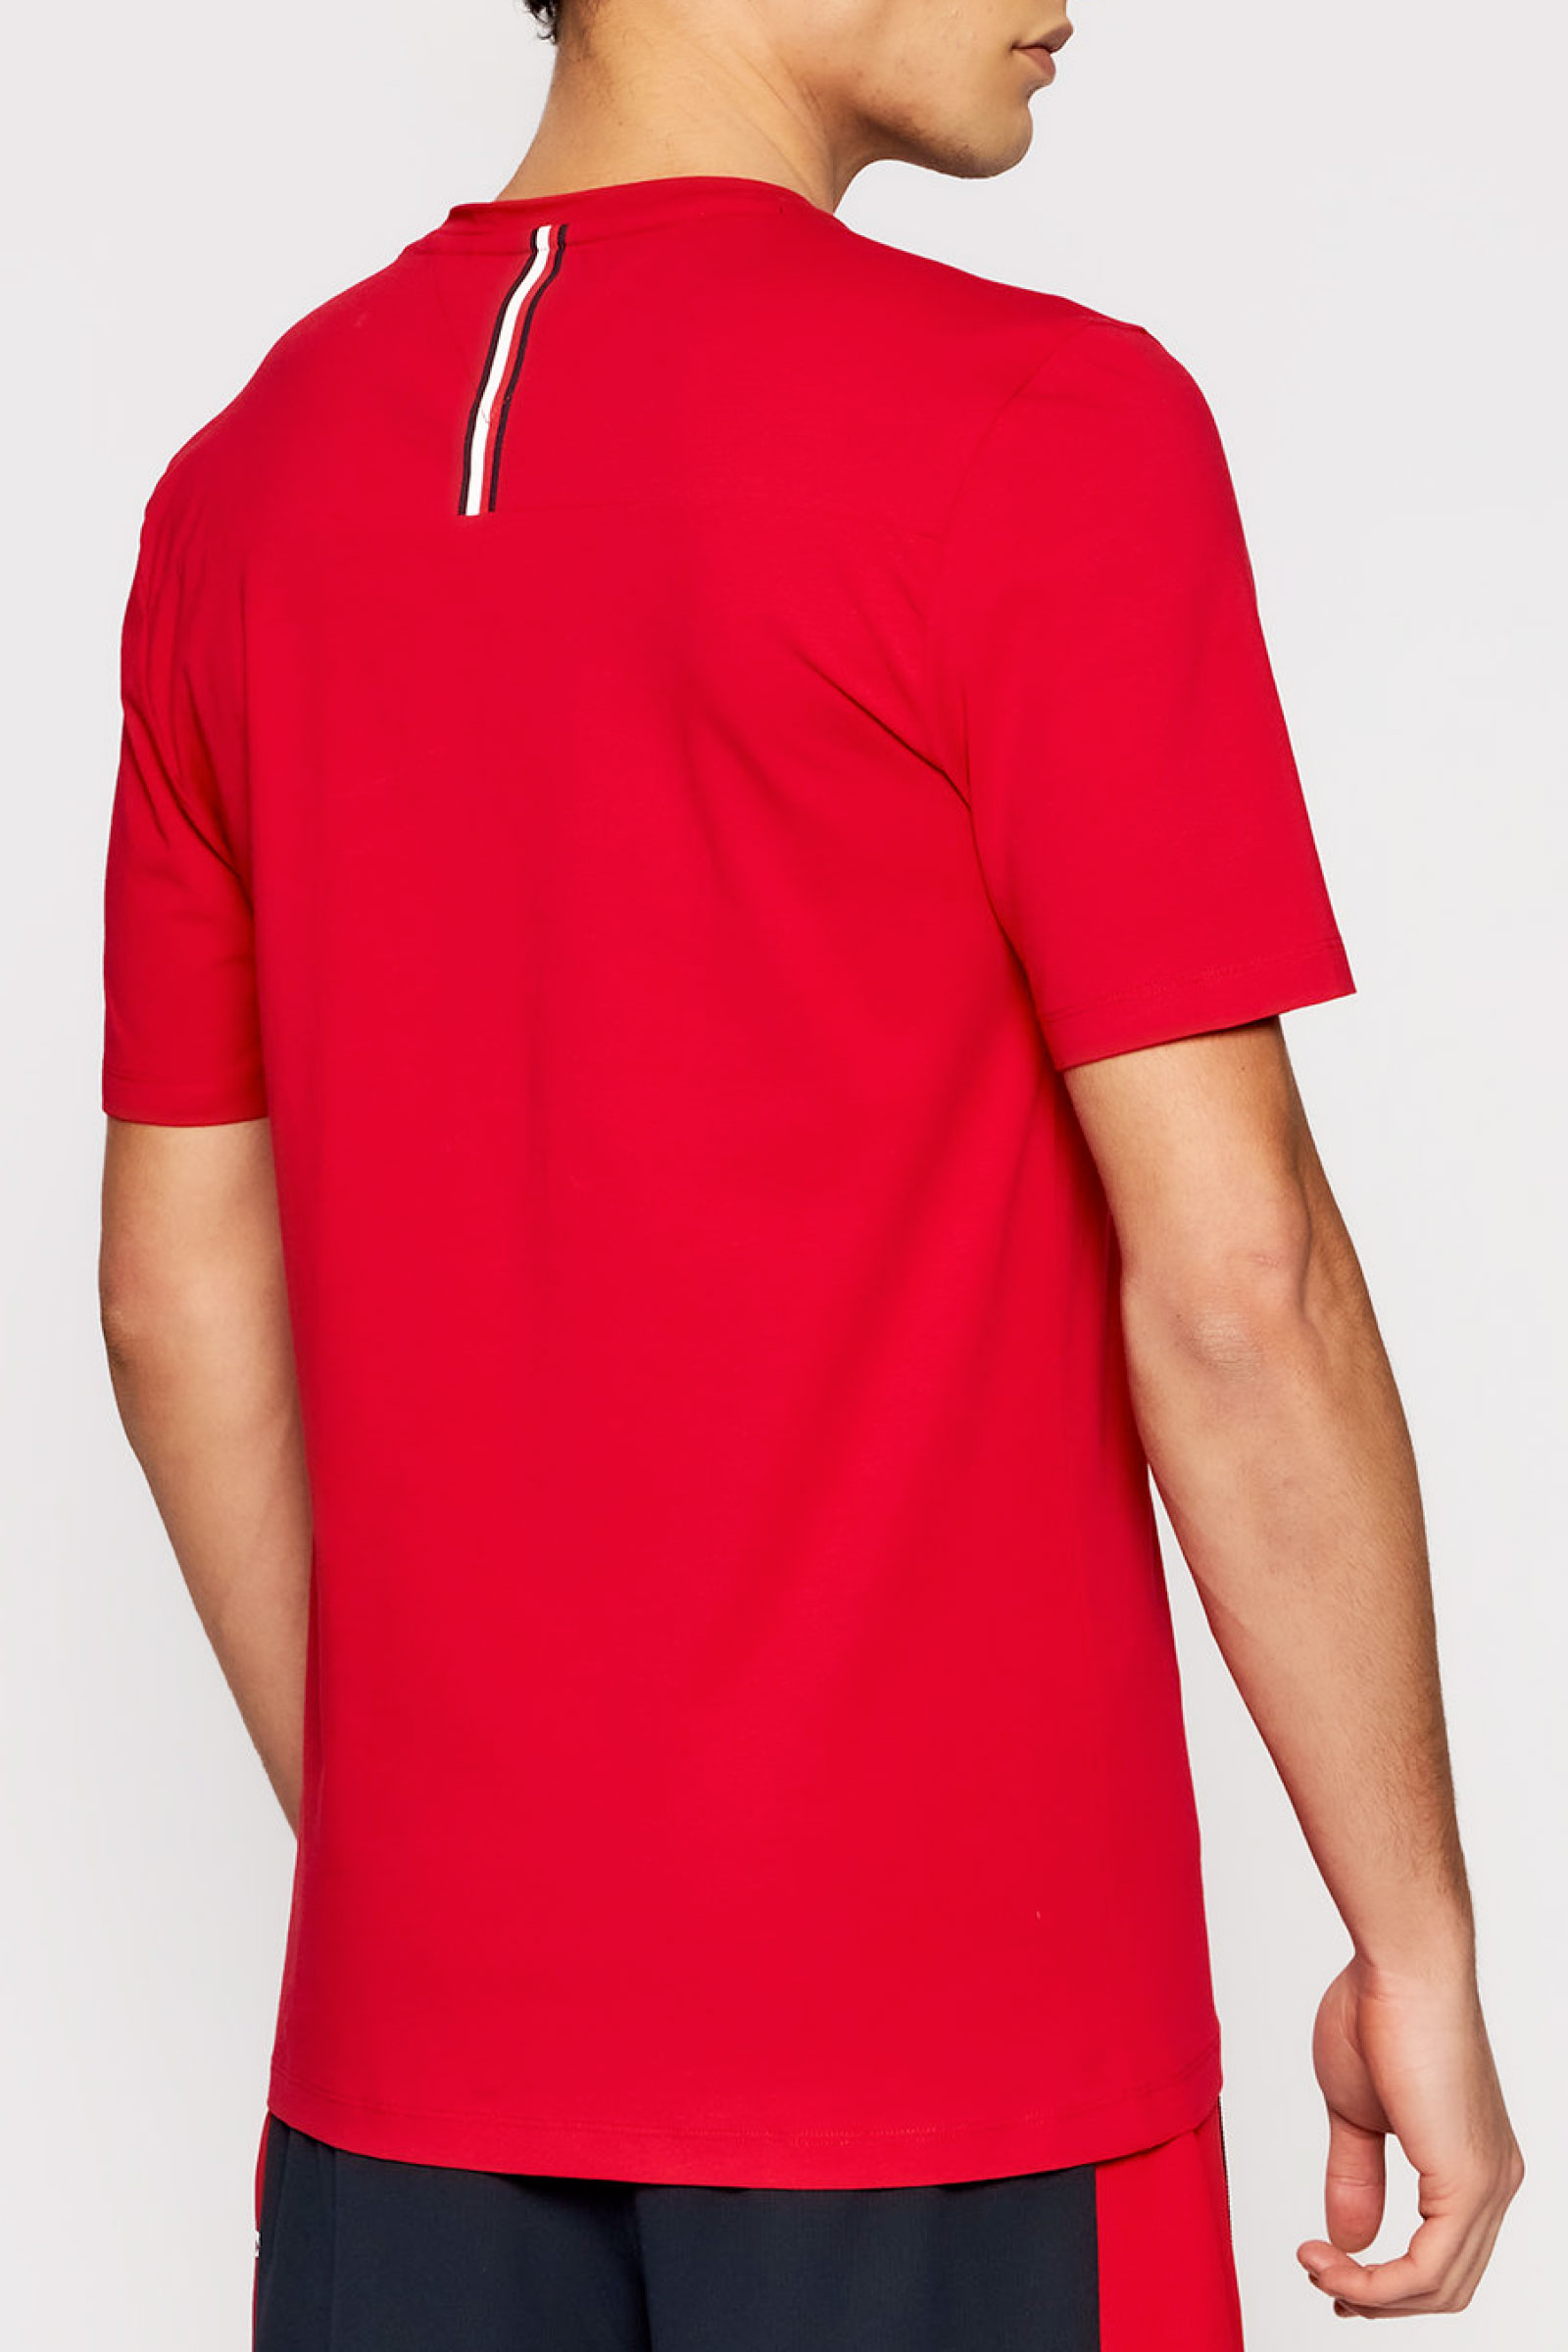 TOMMY HILFIGER T-Shirt Uomo TOMMY HILFIGER   T-Shirt   MW0MW17373XLG